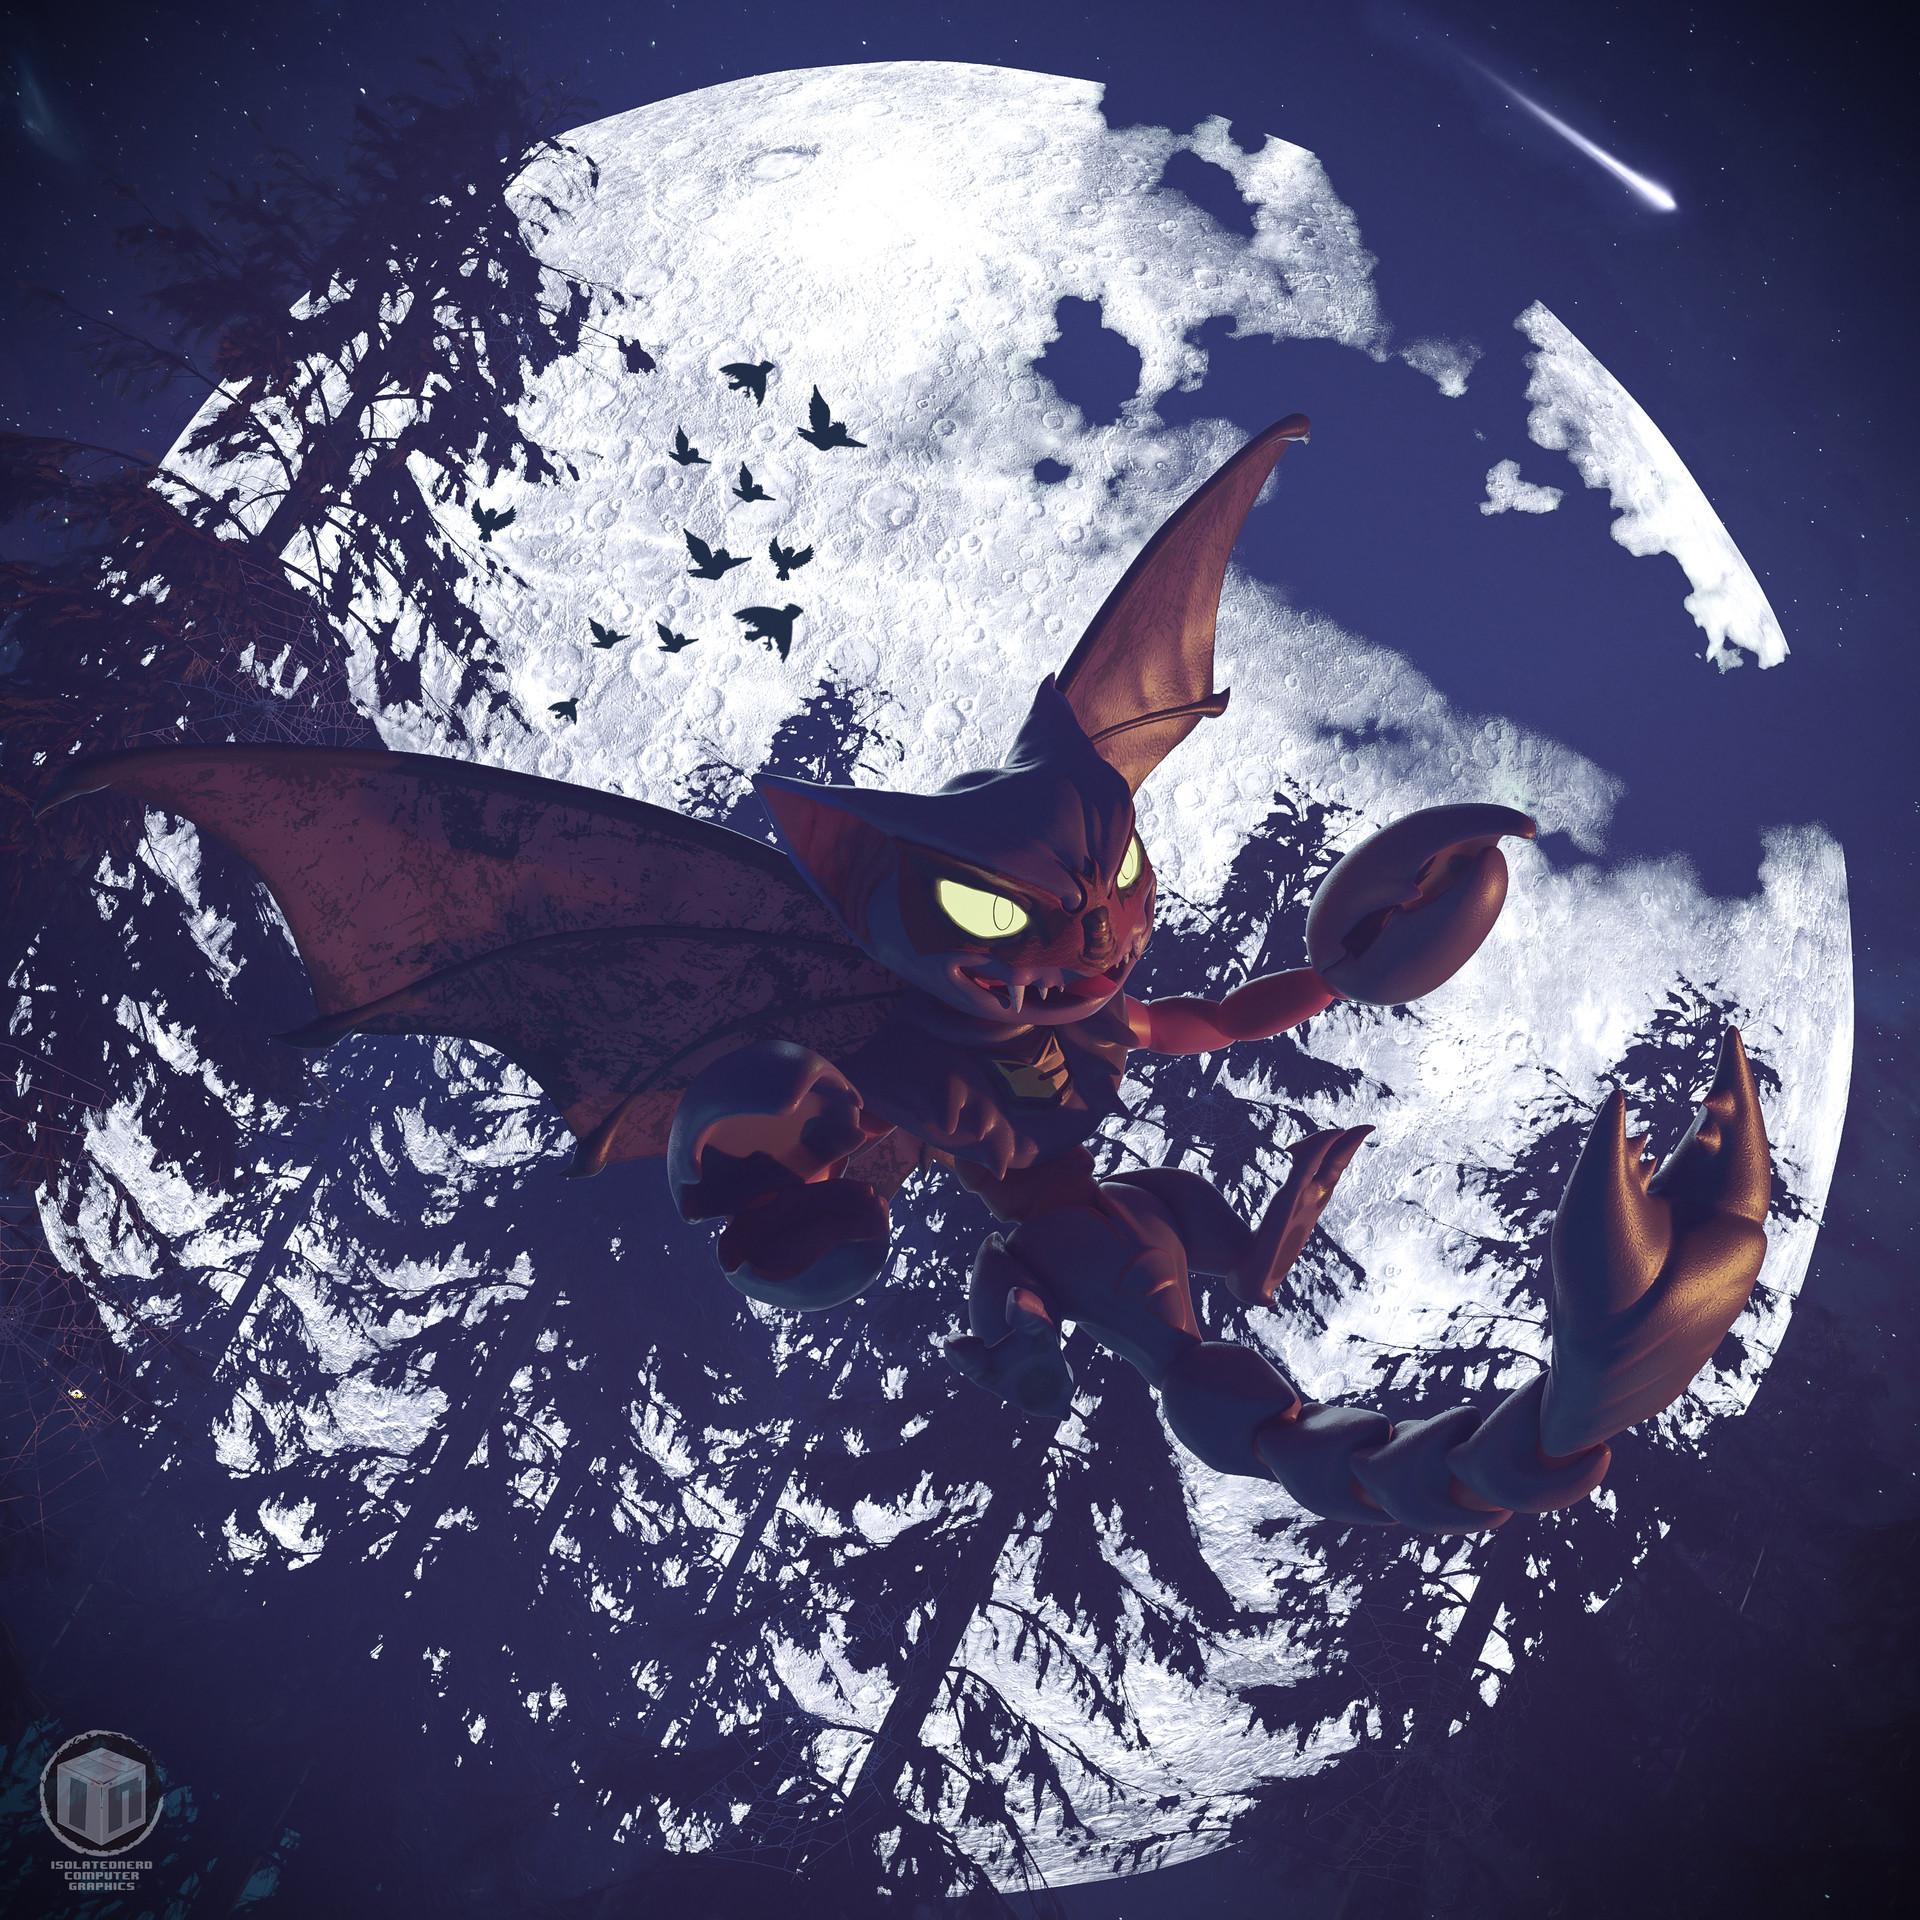 Matias toloza isolatednerdcg gliscor moonlight incg